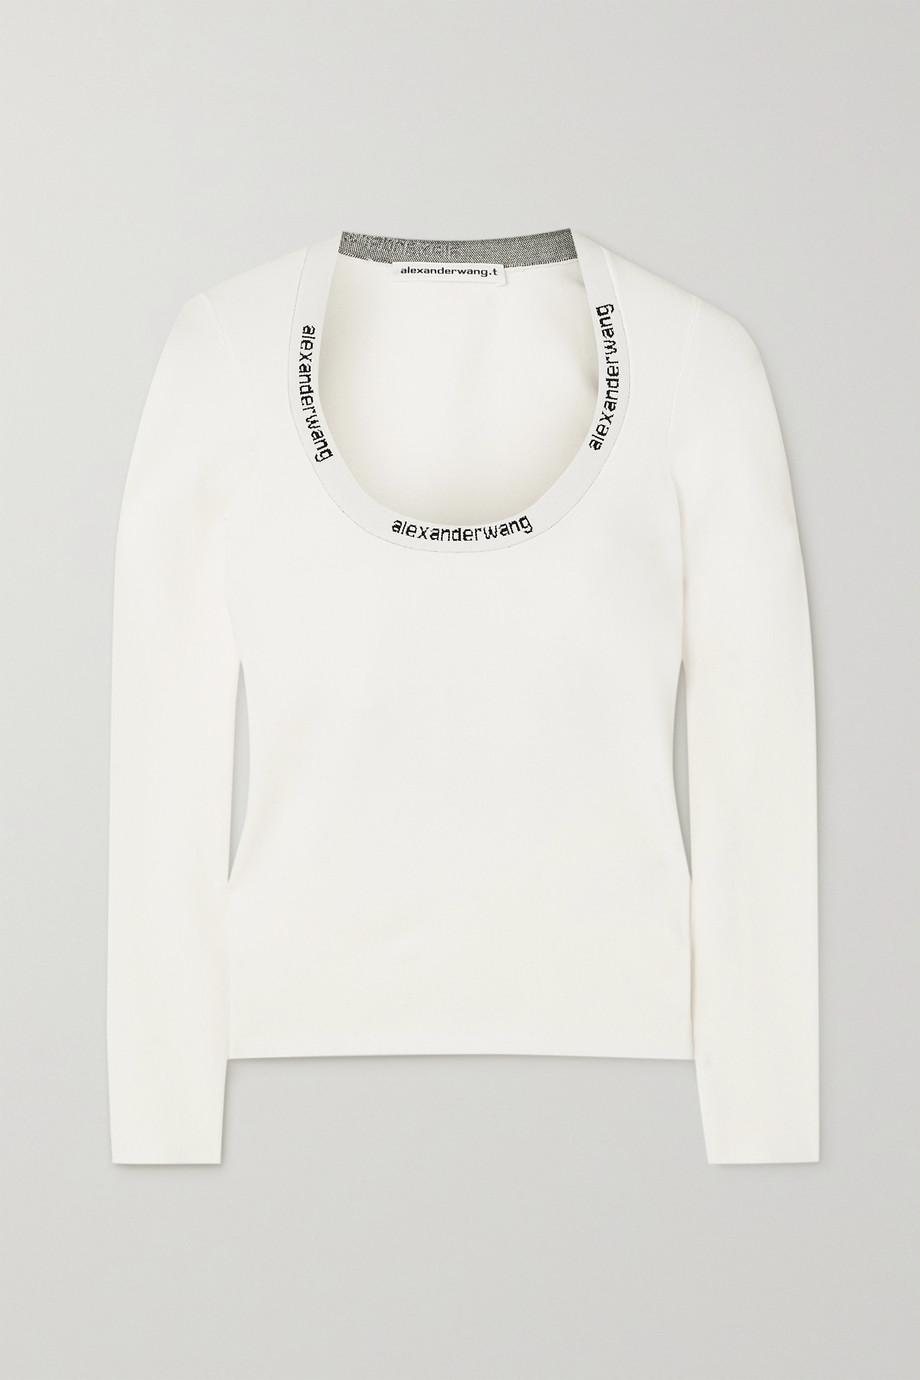 alexanderwang.t Intarsia stretch-knit top